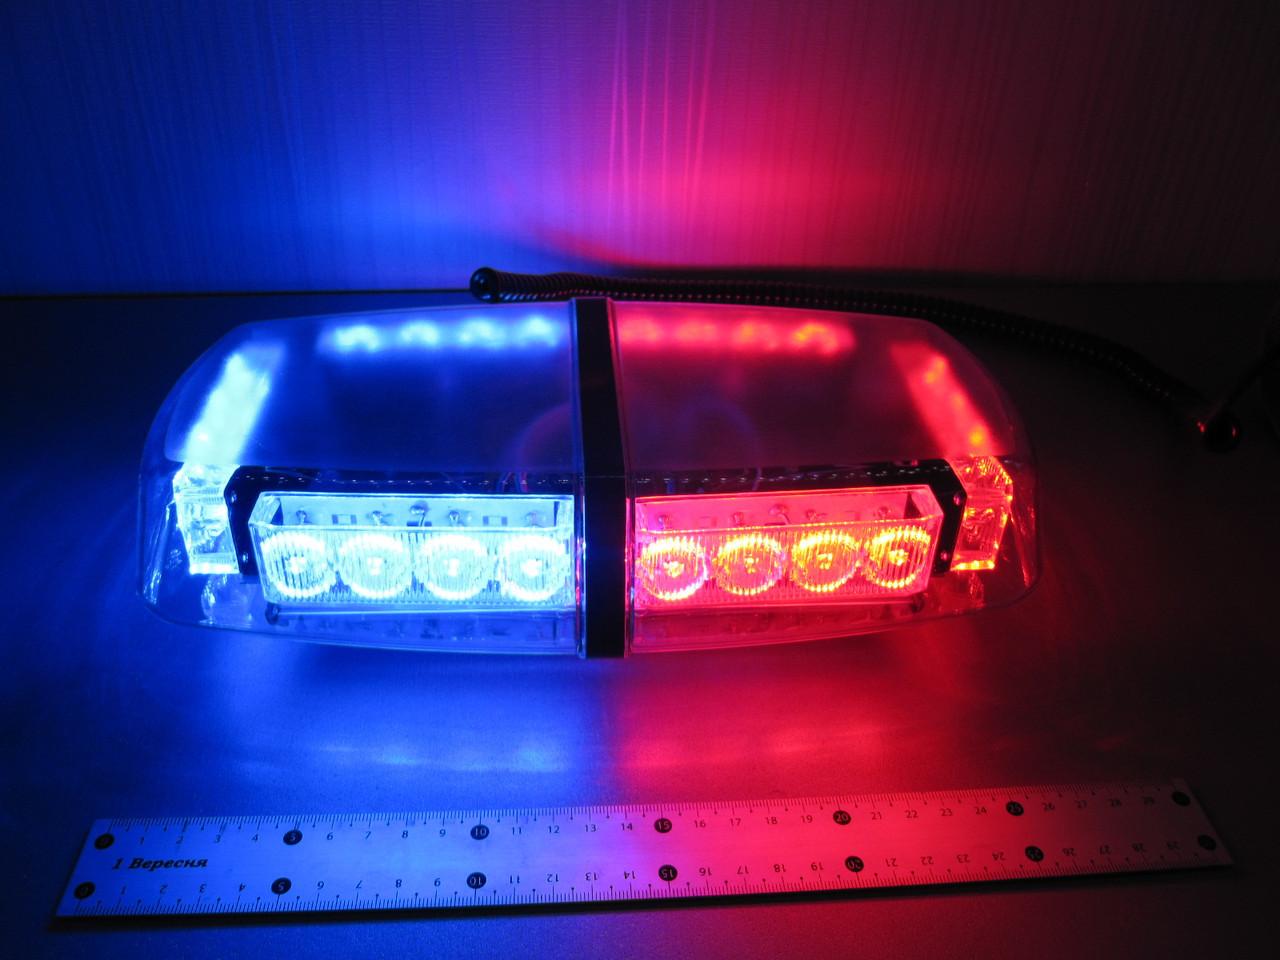 Световая панель LED - 650, мигалка красно - синяя 12-24В. https://gv-auto.com.ua